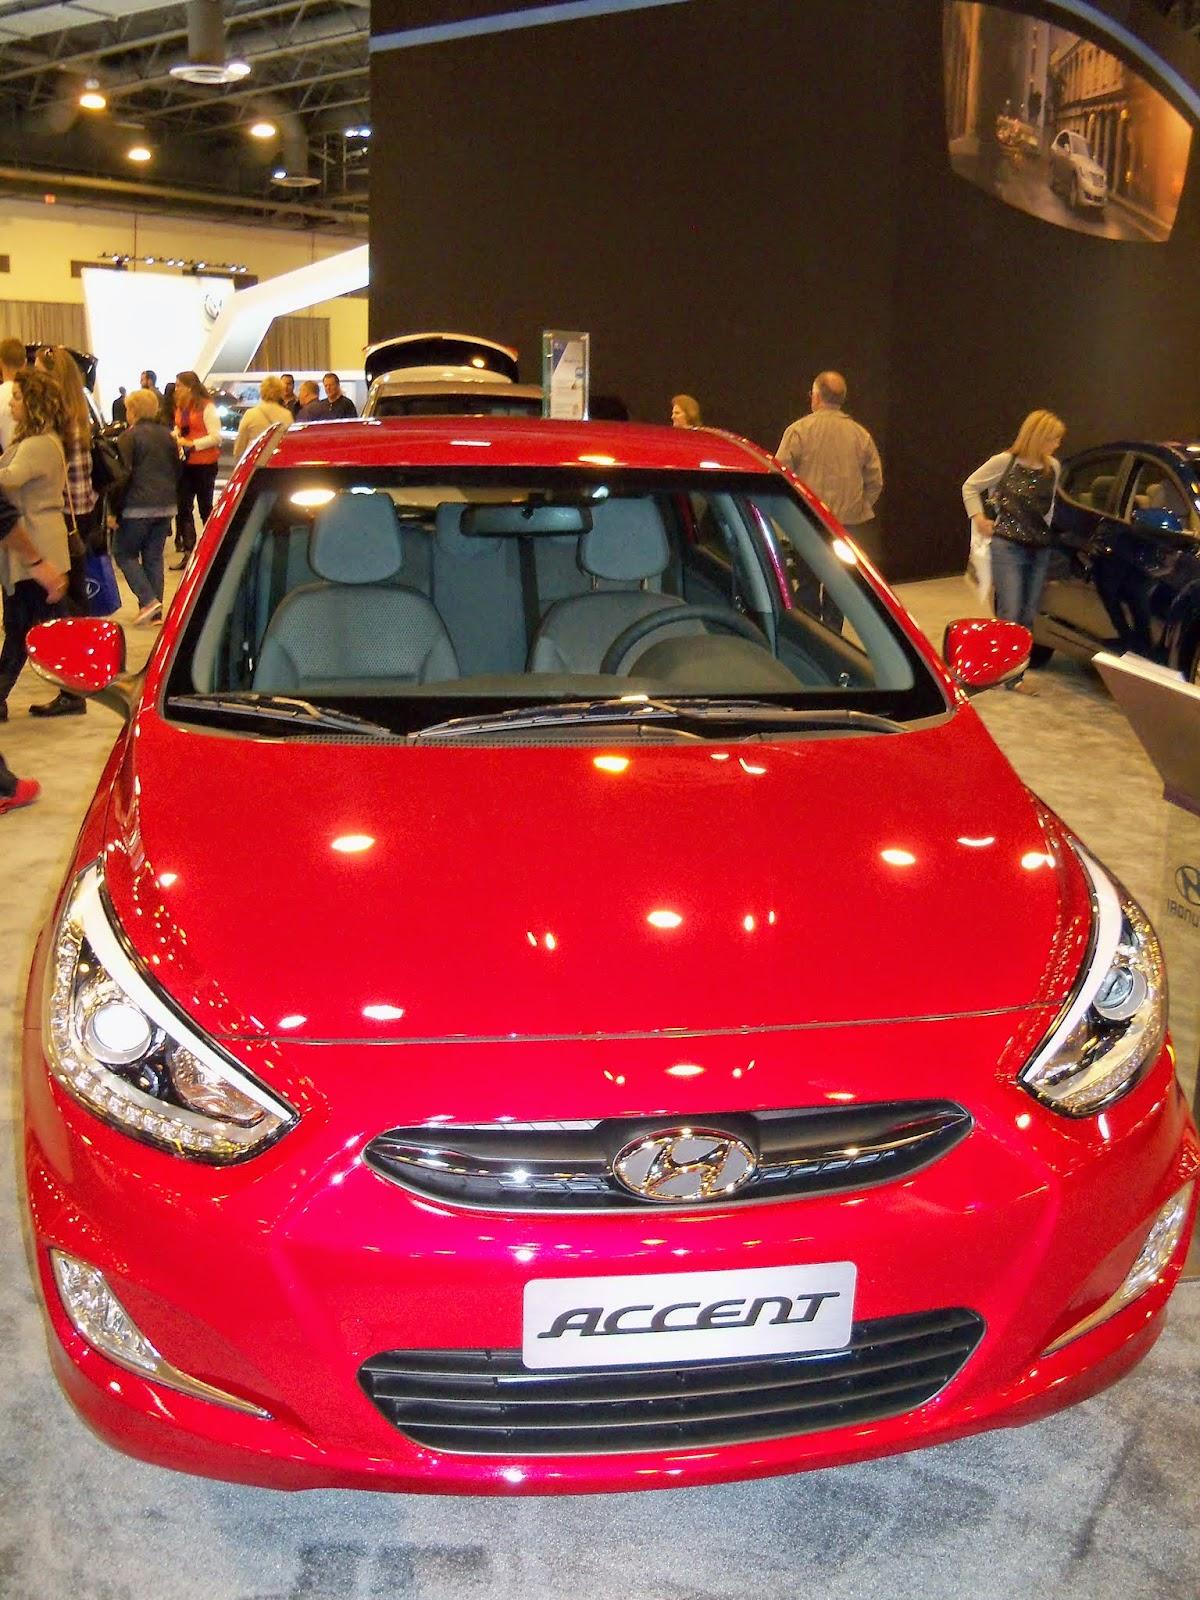 Houston Auto Show 2015 - 116_7327.JPG